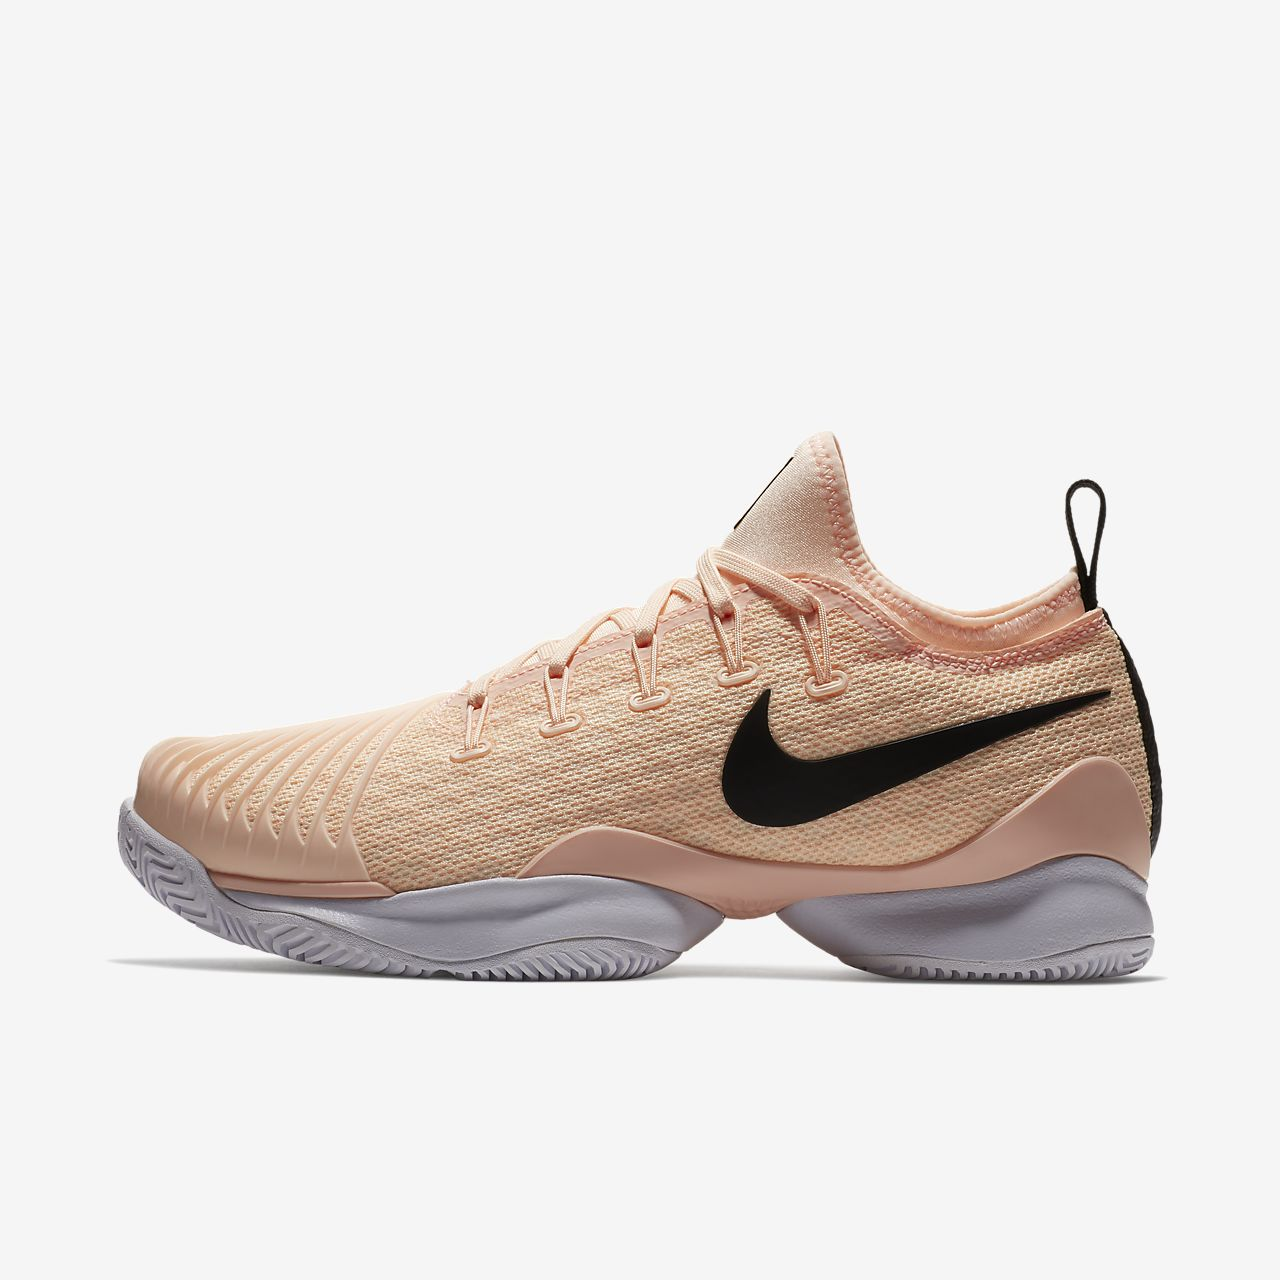 huge discount 574c4 5445c Nike Air Zoom Ultra React - Crimson Tint - Tennis Scanner